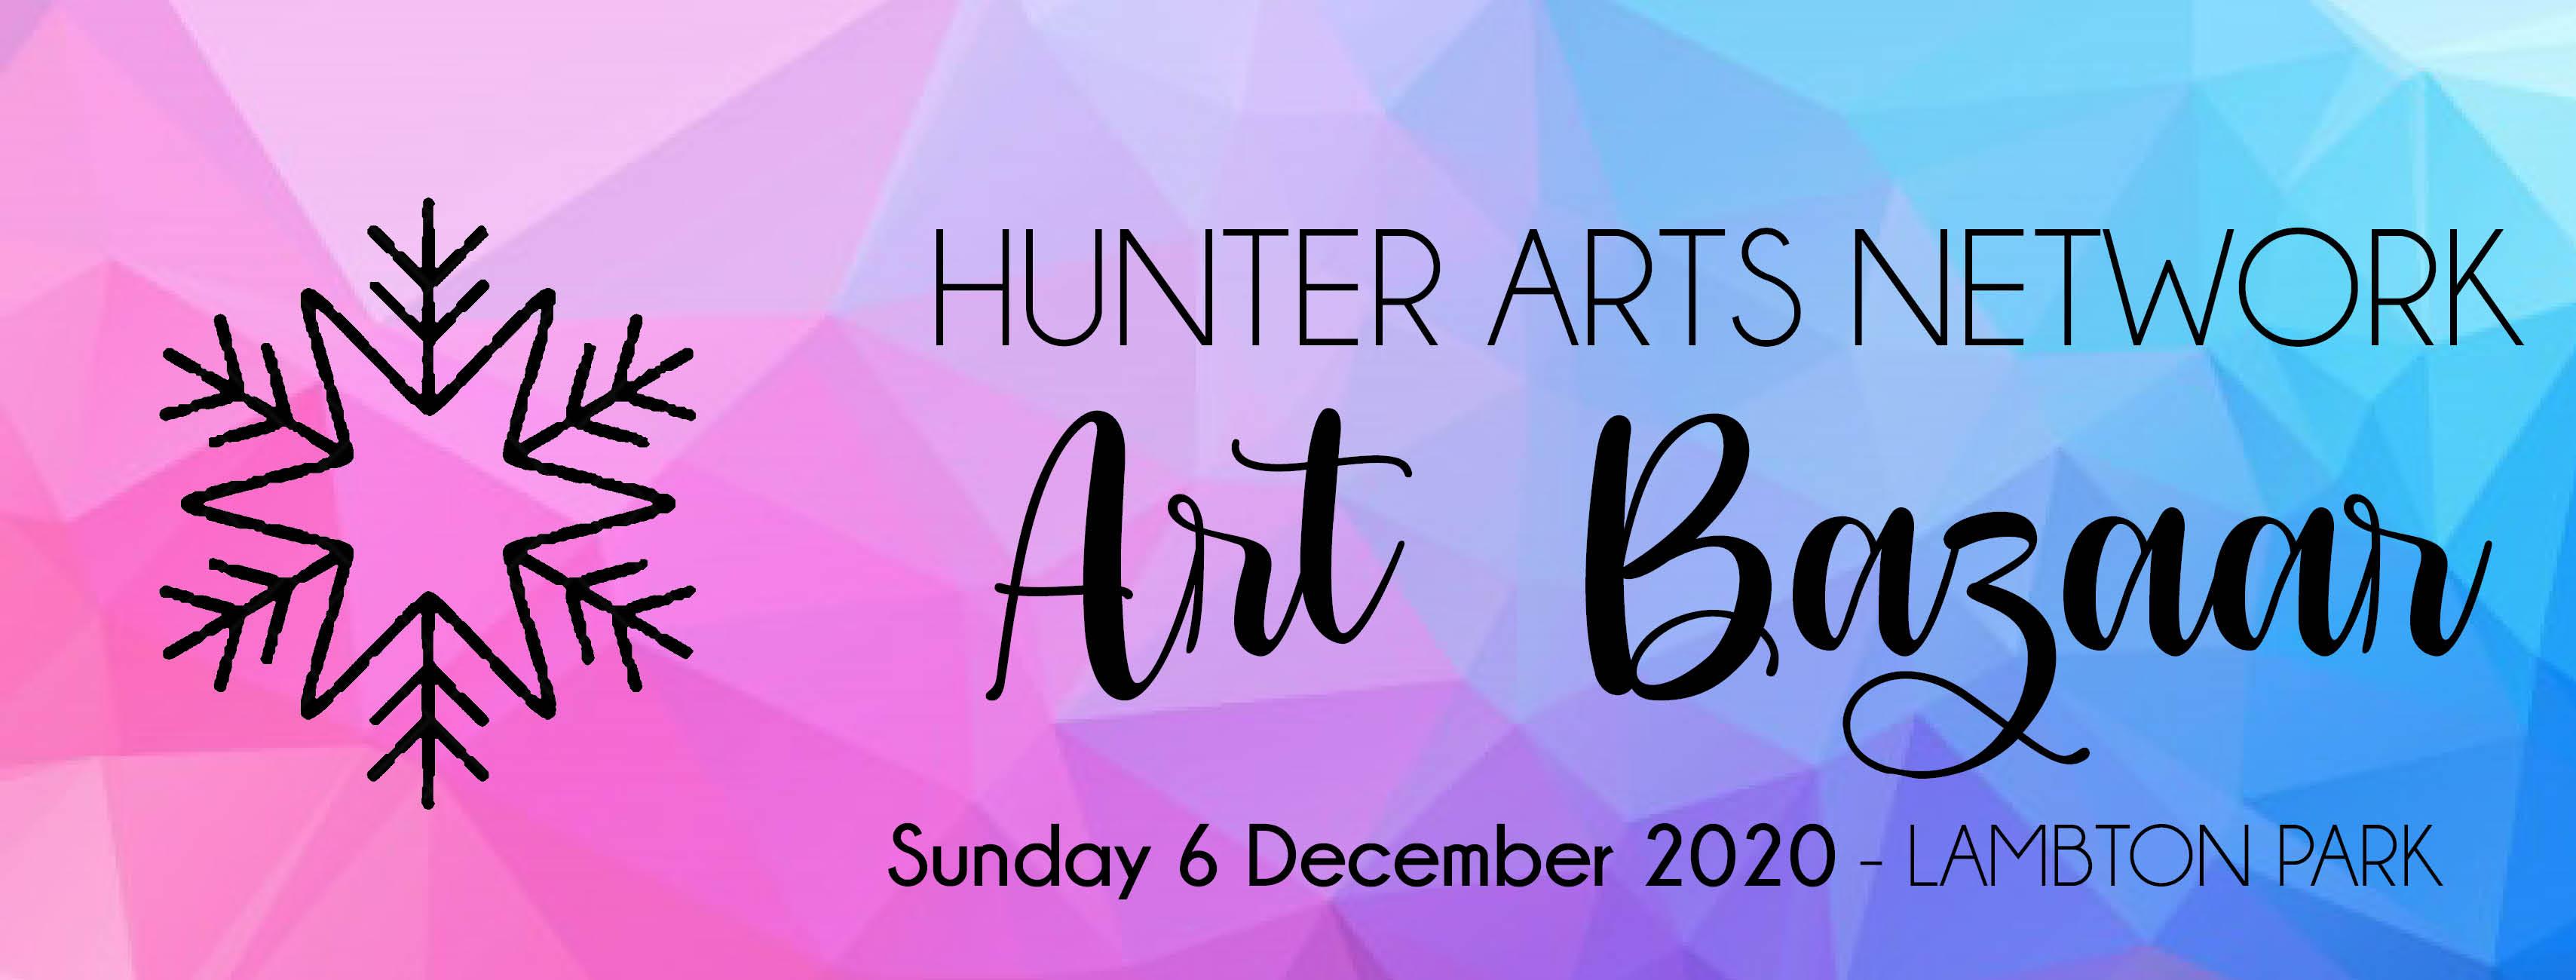 Download artwork for Hunter Arts Network Art Bazaar Sunday 6 December Lambton Park